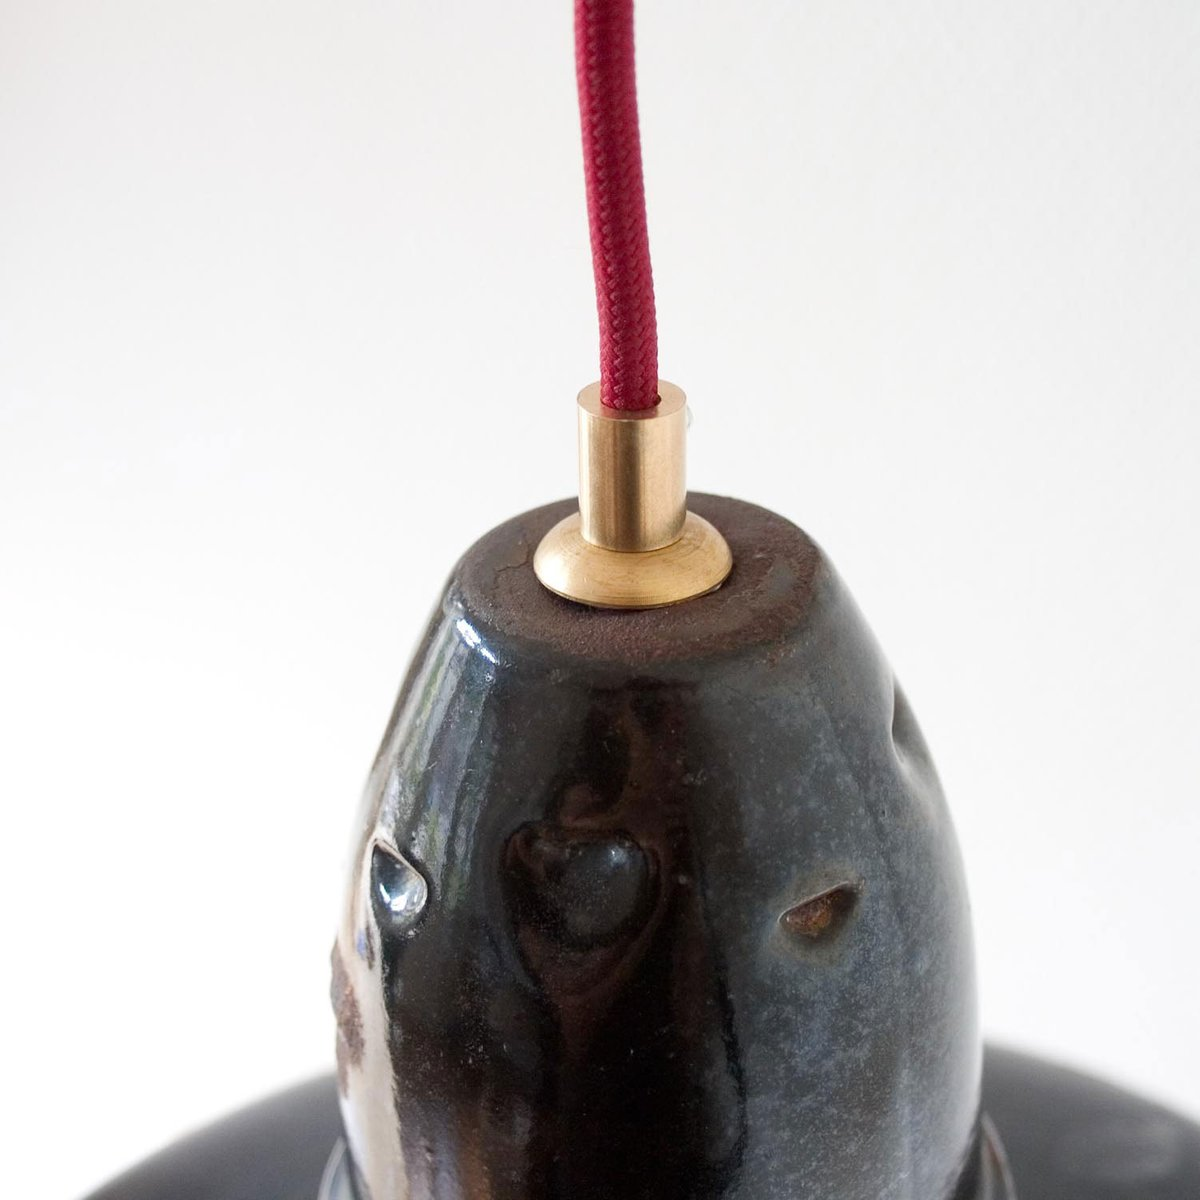 lampe suspension industrielle vintage noire emaill e france en vente sur pamono. Black Bedroom Furniture Sets. Home Design Ideas